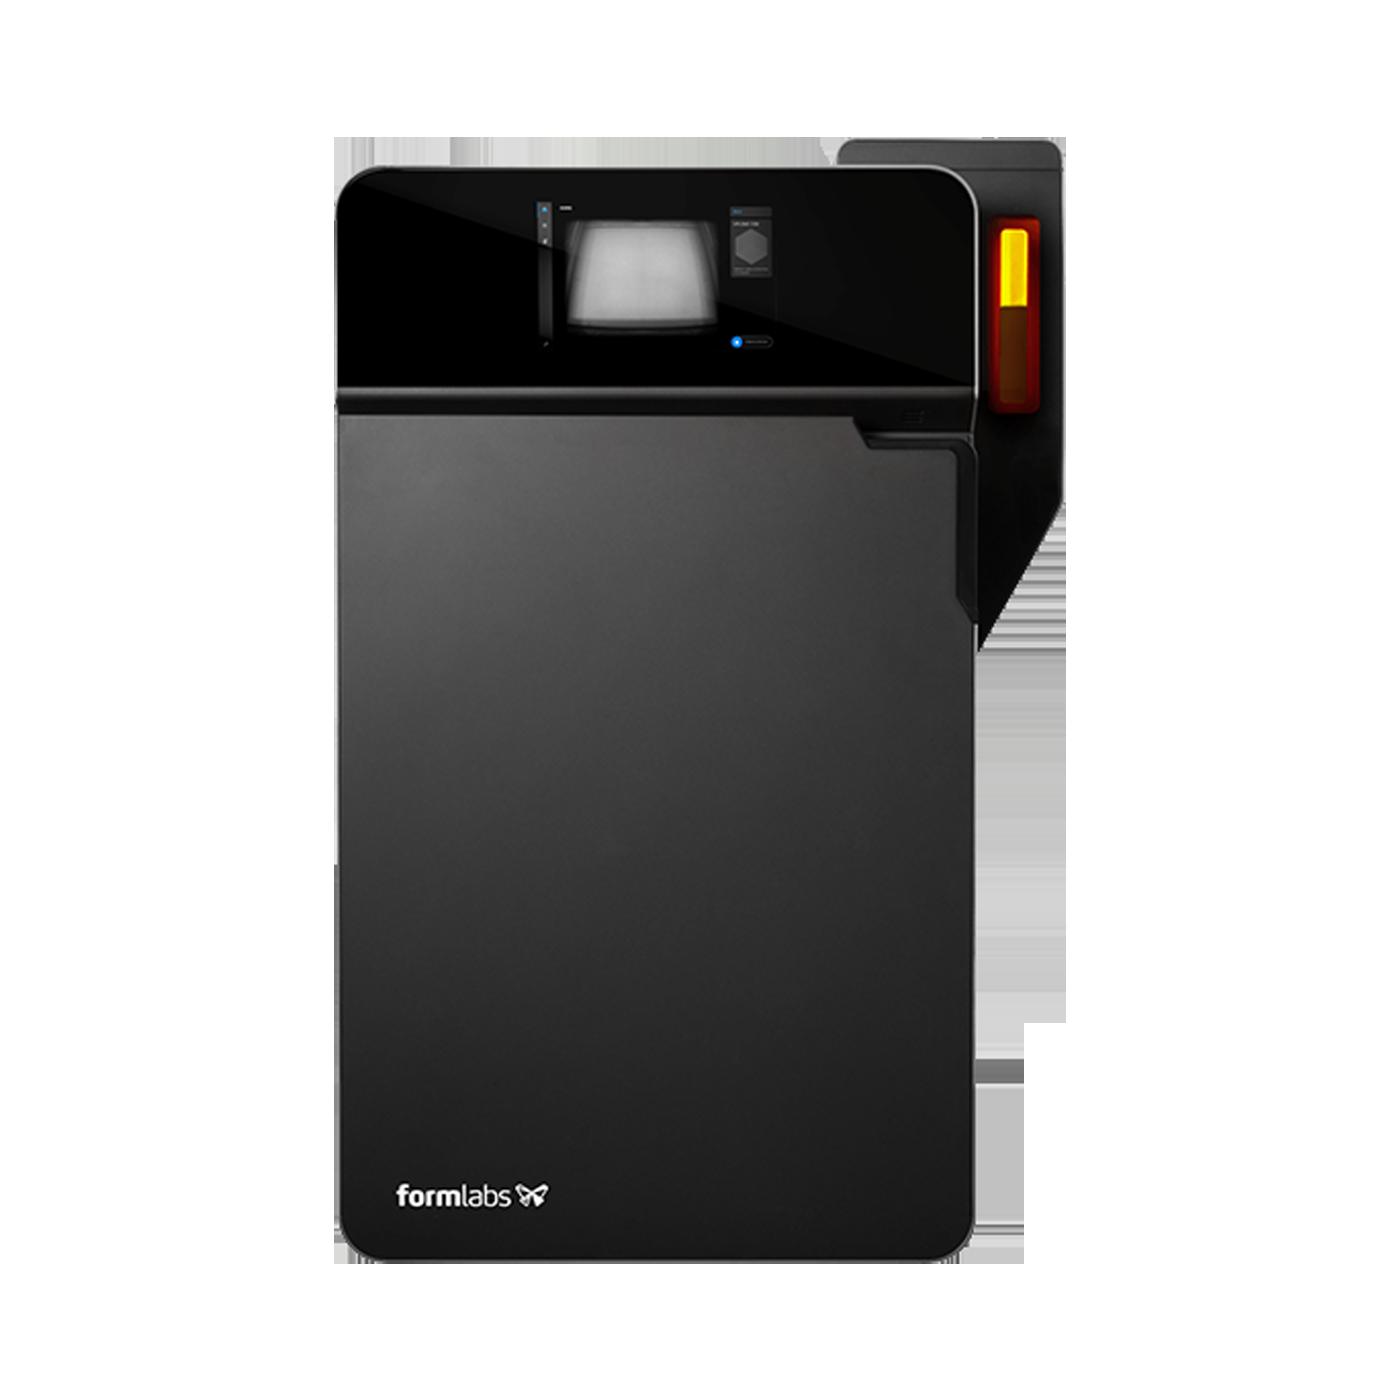 Formlabs Fuse1 SLS 3D printer